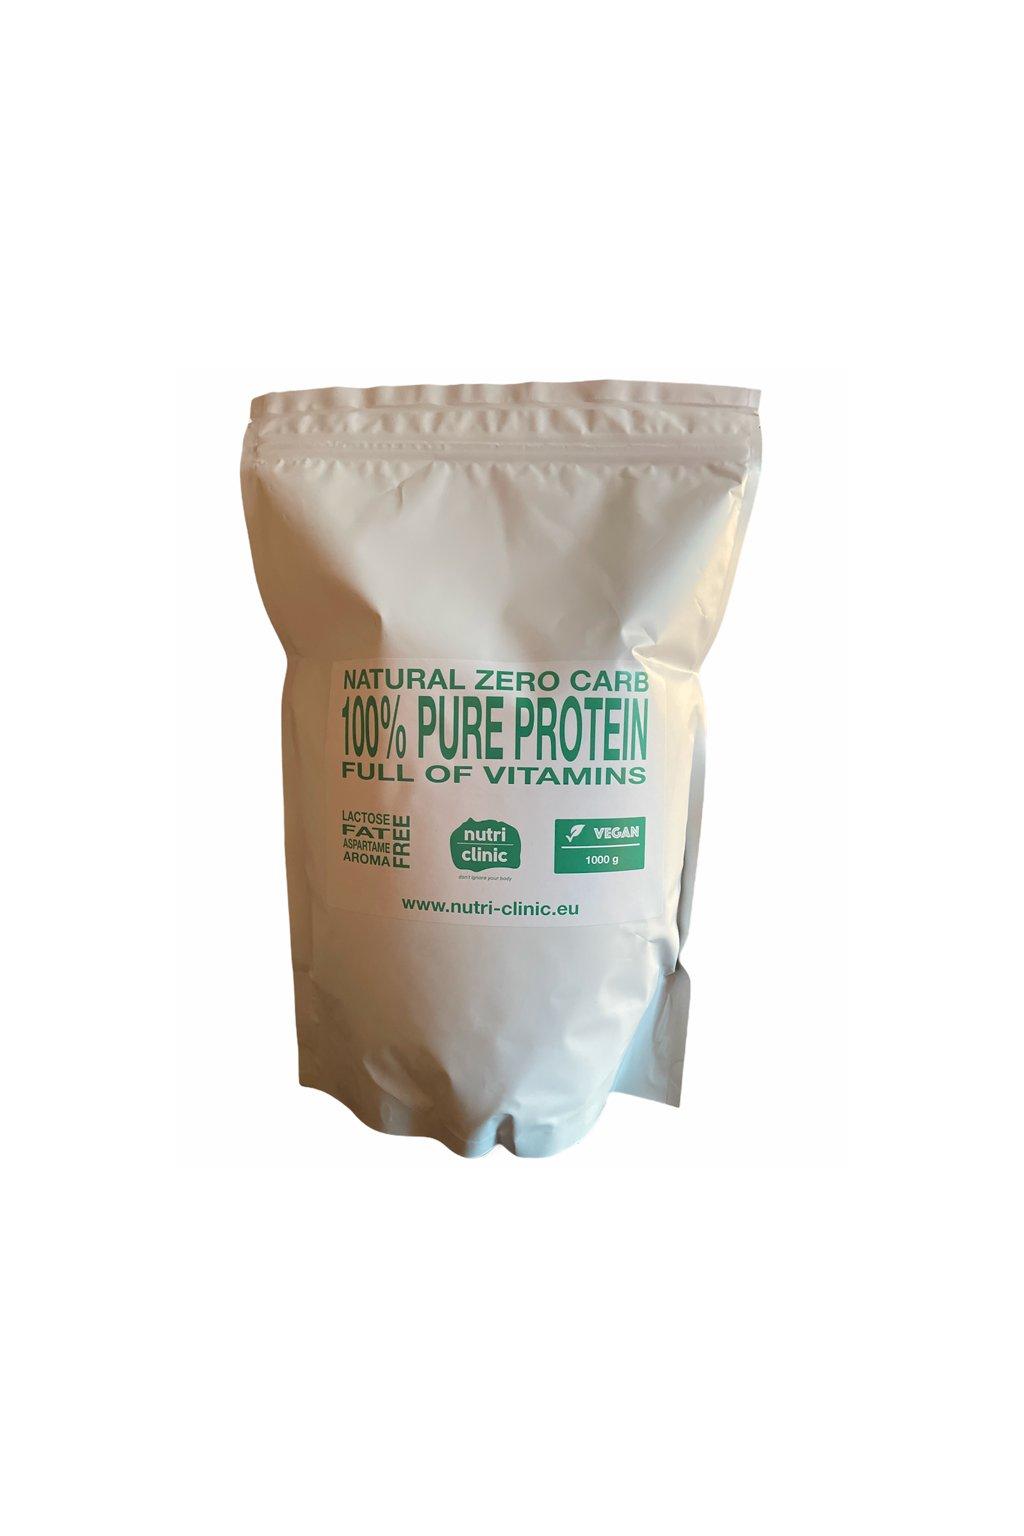 Nutri clinic Pure protein